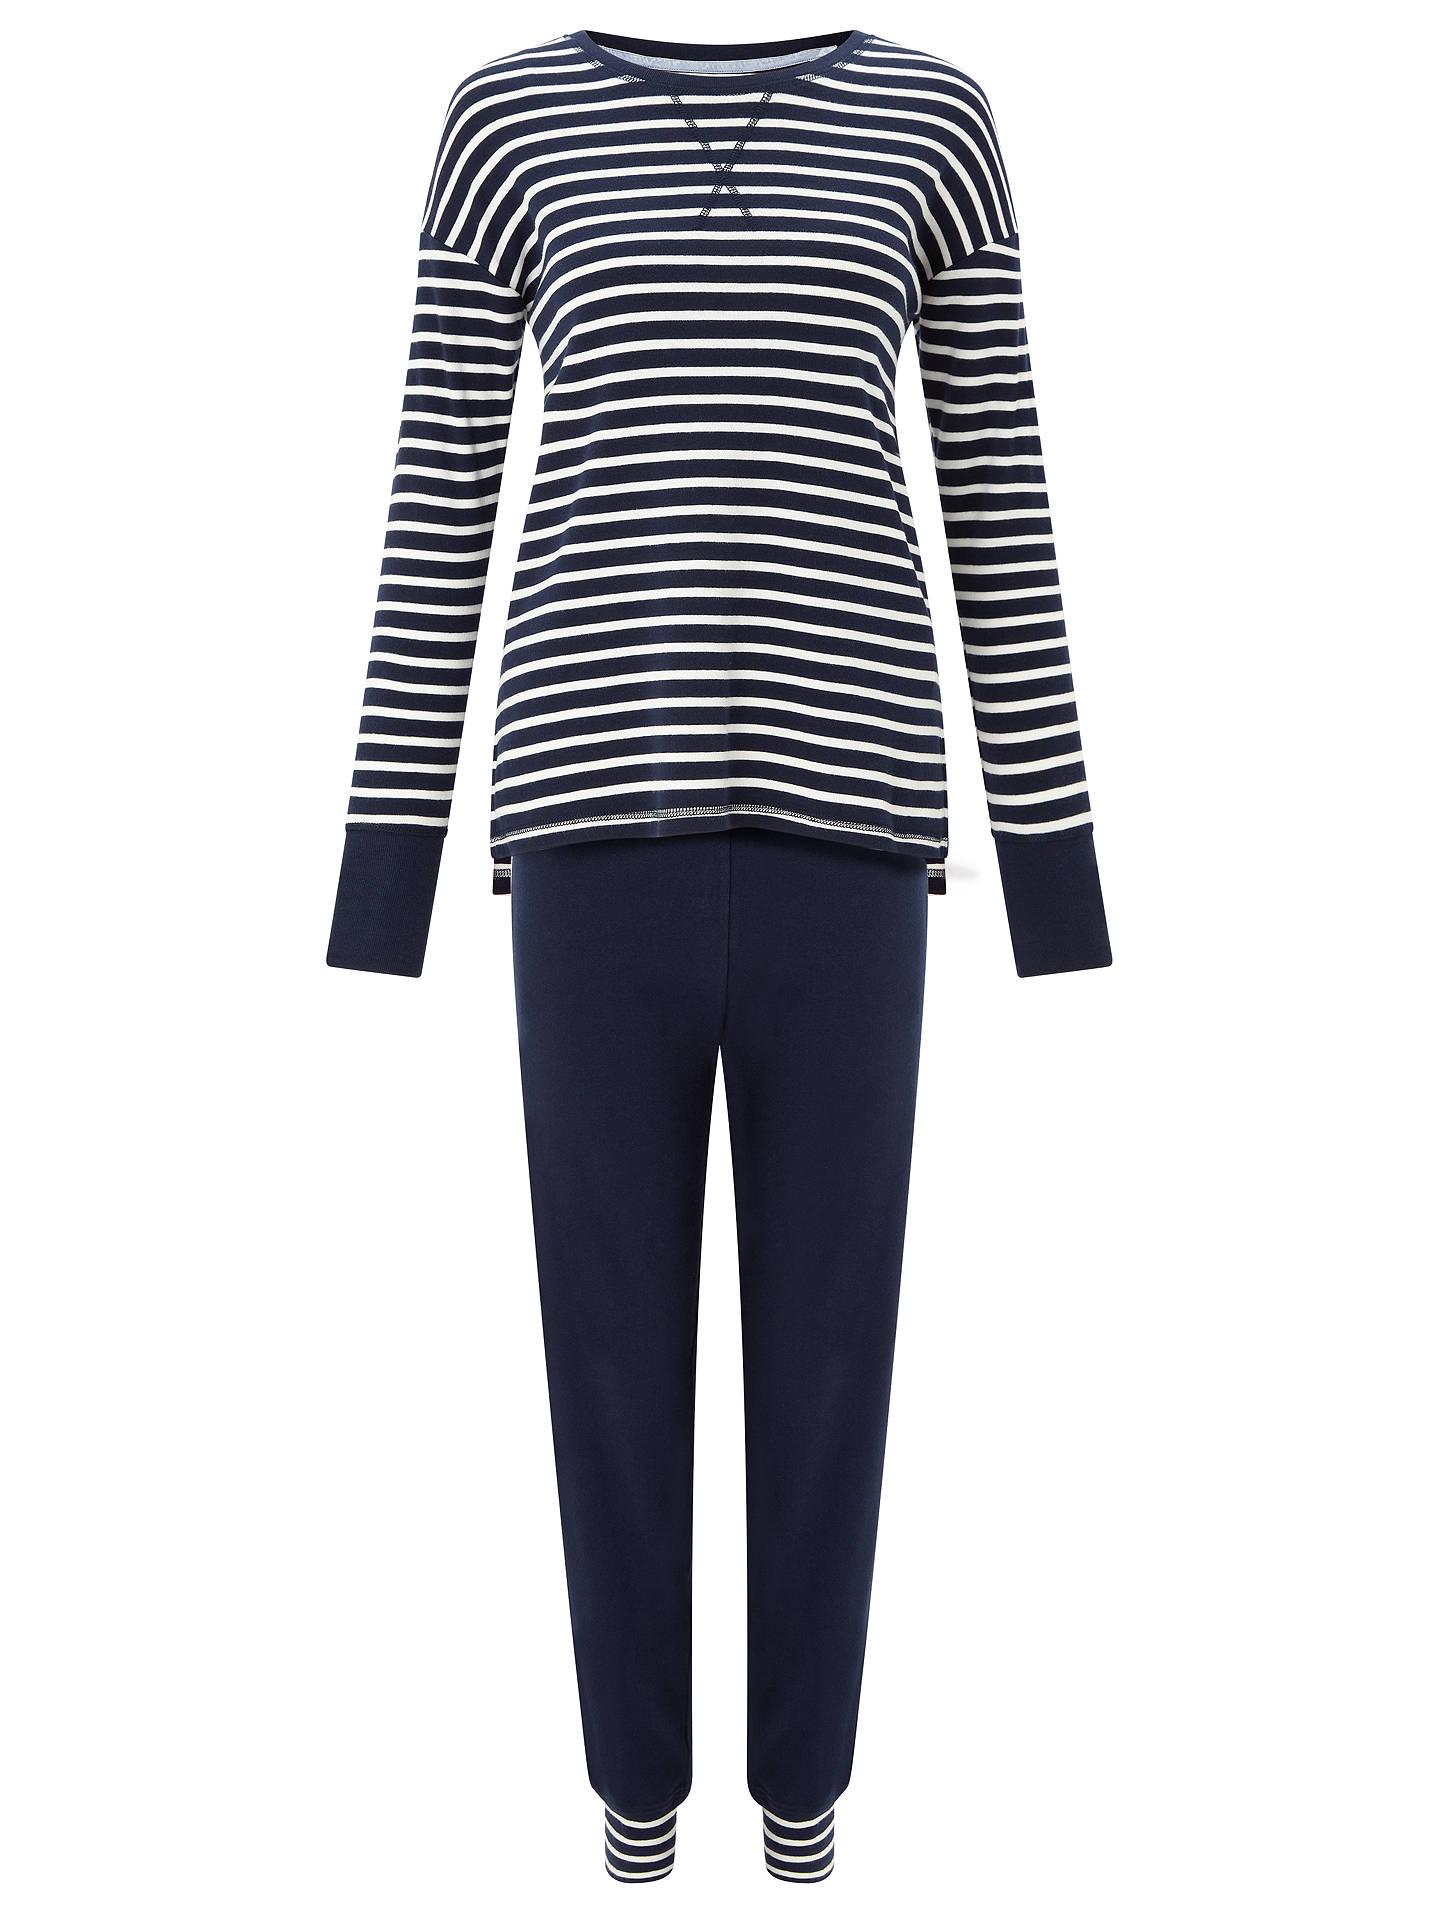 b01db00318 John Lewis & Partners Edie Striped Top Jersey Pyjama Set, Navy/White